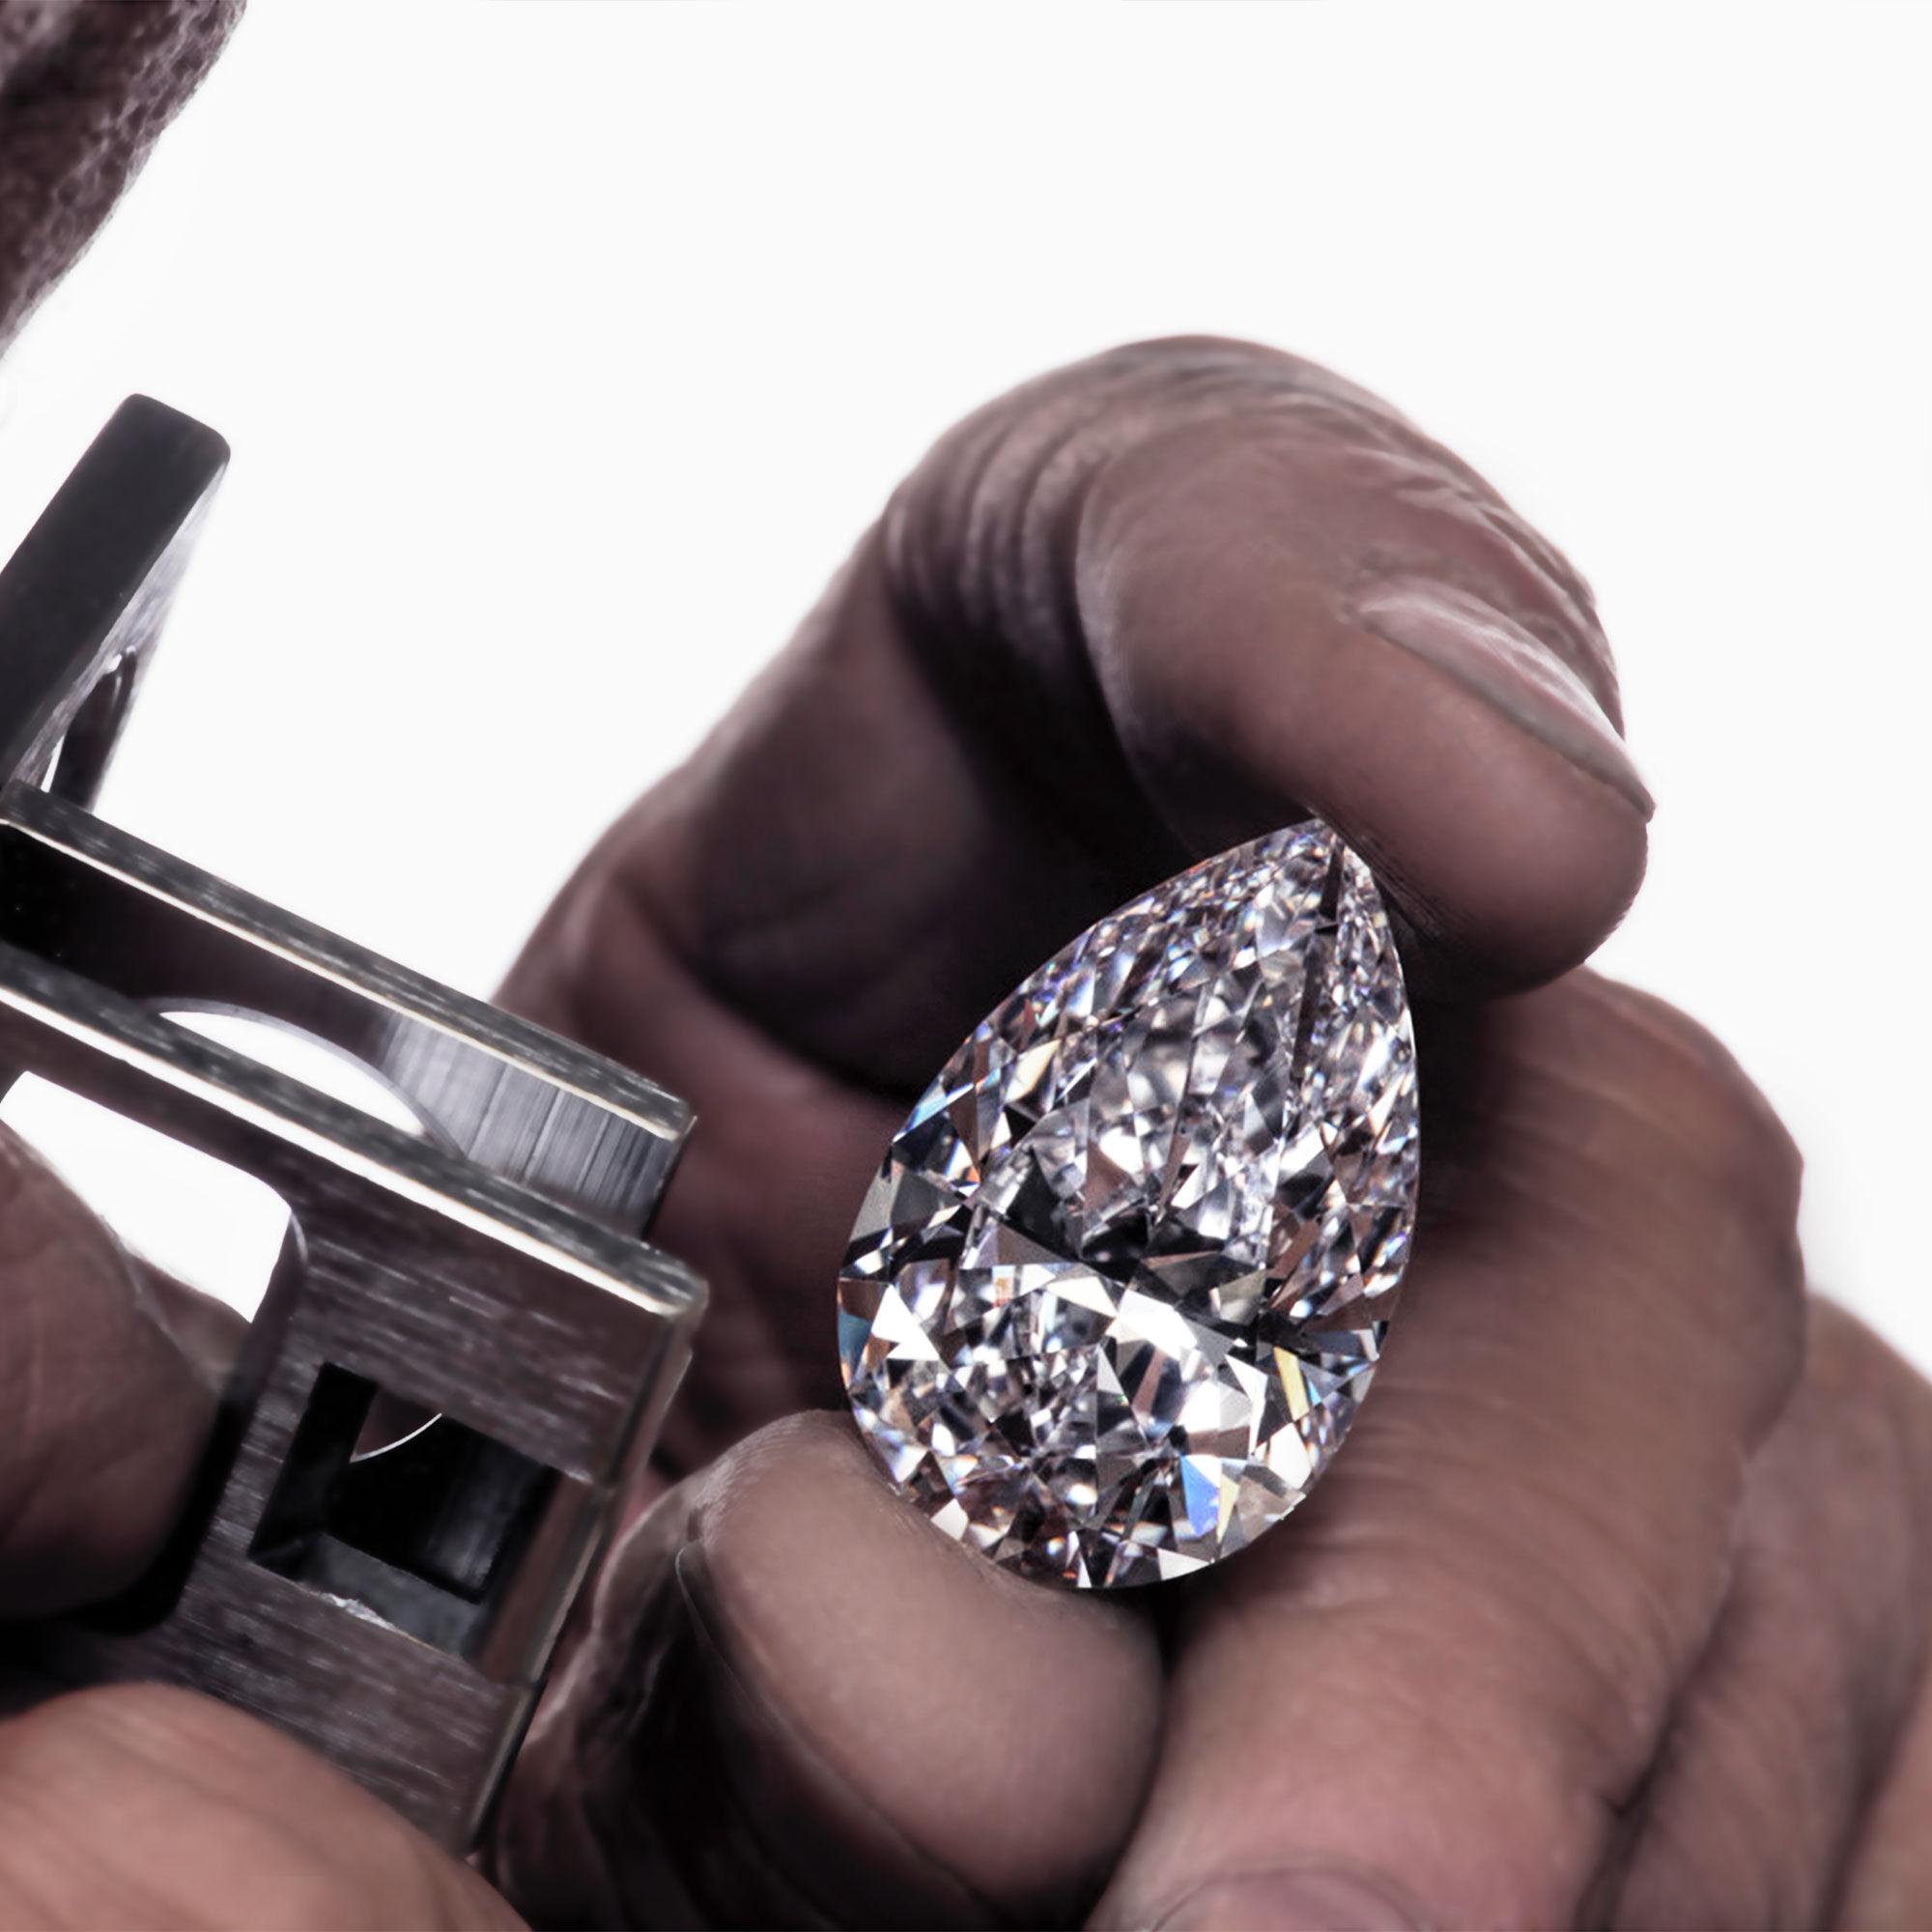 Close up of a Graff craftsman investigating a pear shape diamond through a loupe